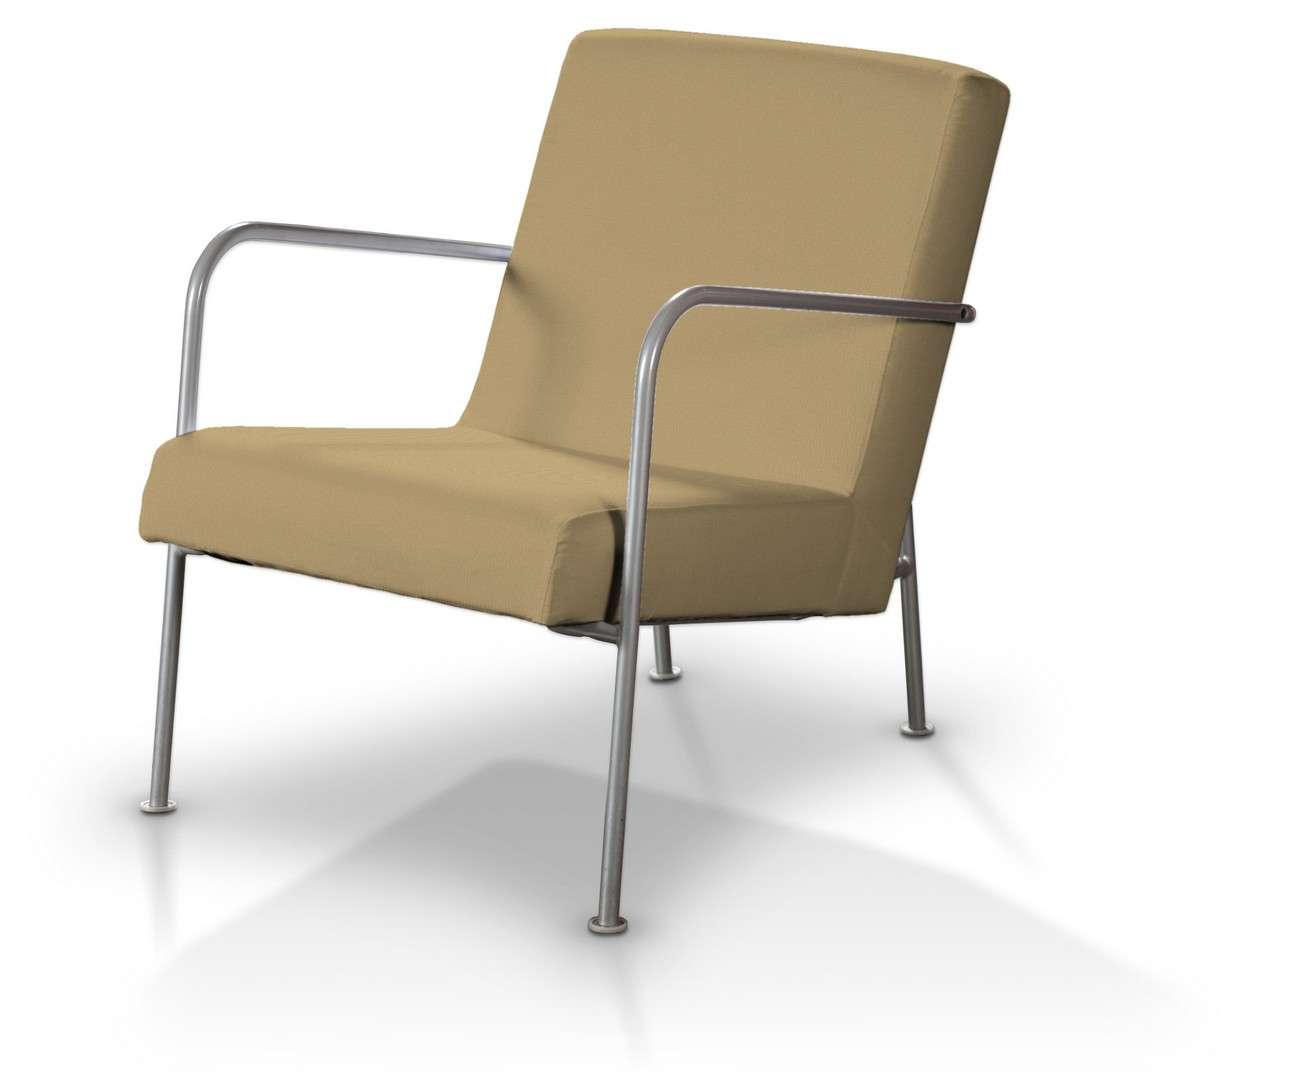 Potah na křeslo Ikea PS v kolekci Living II, látka: 160-93